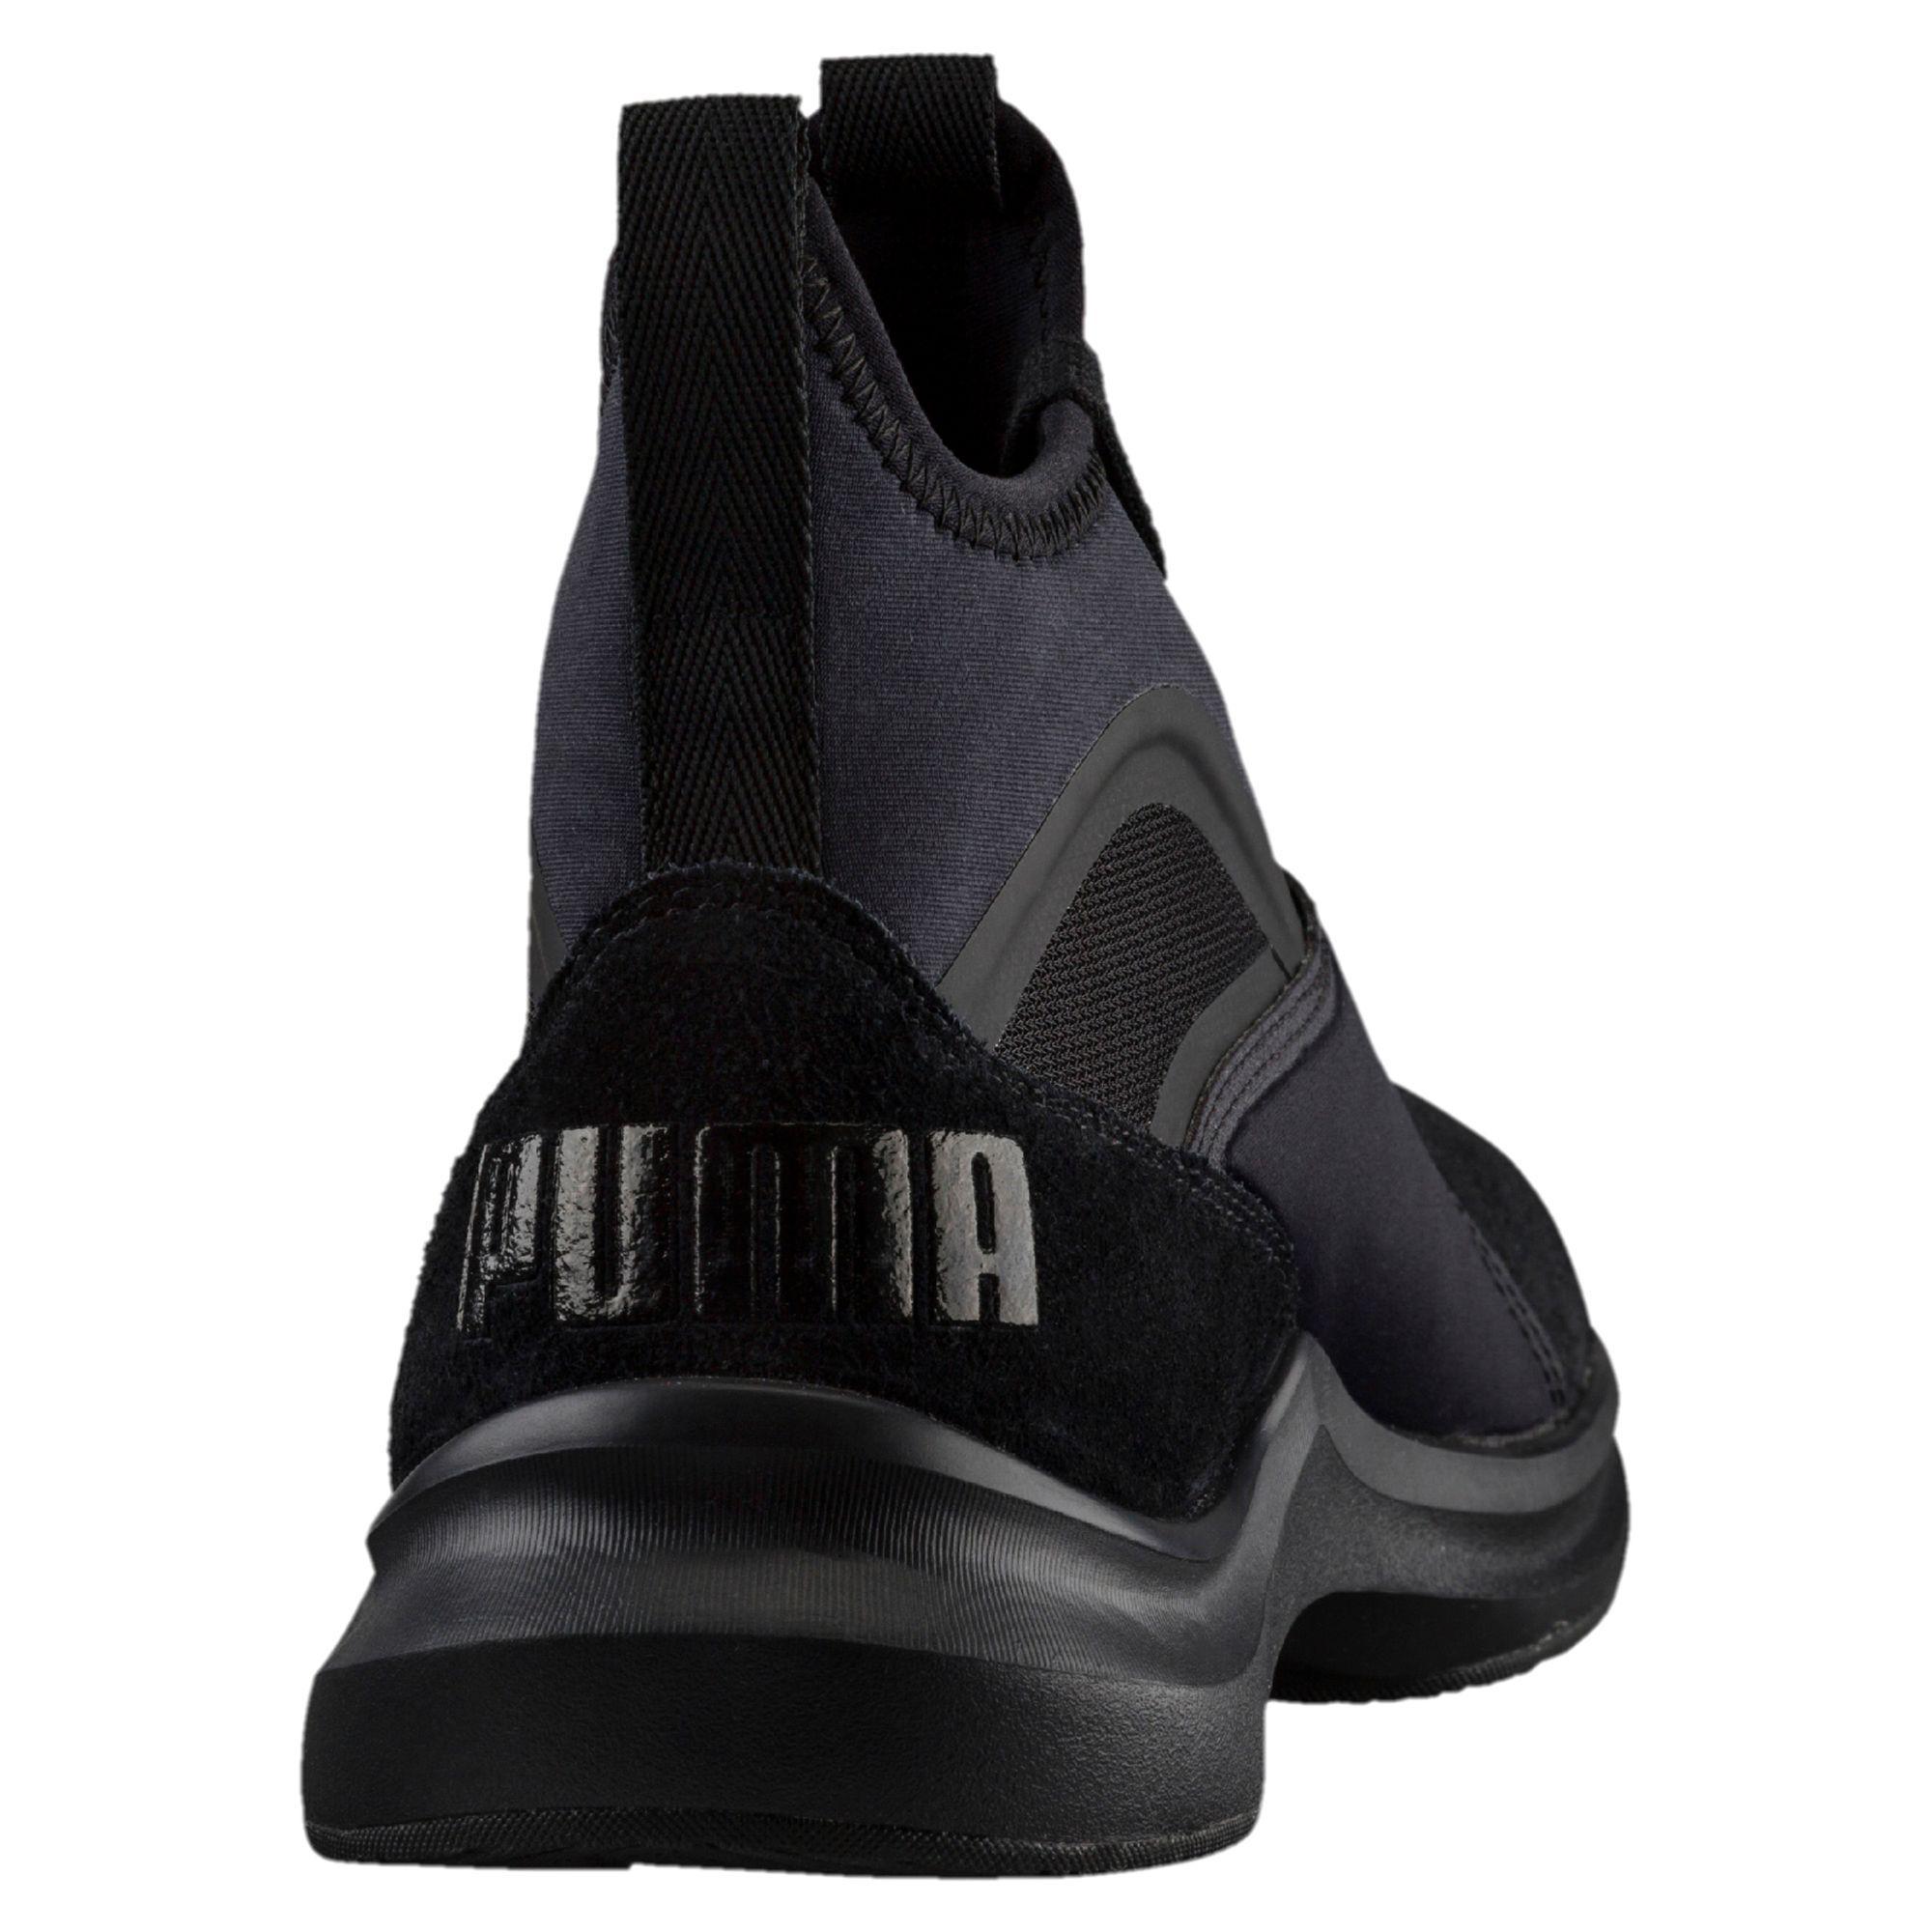 PUMA - Black Phenom Suede Training Shoes - Lyst. View fullscreen 832ed311f